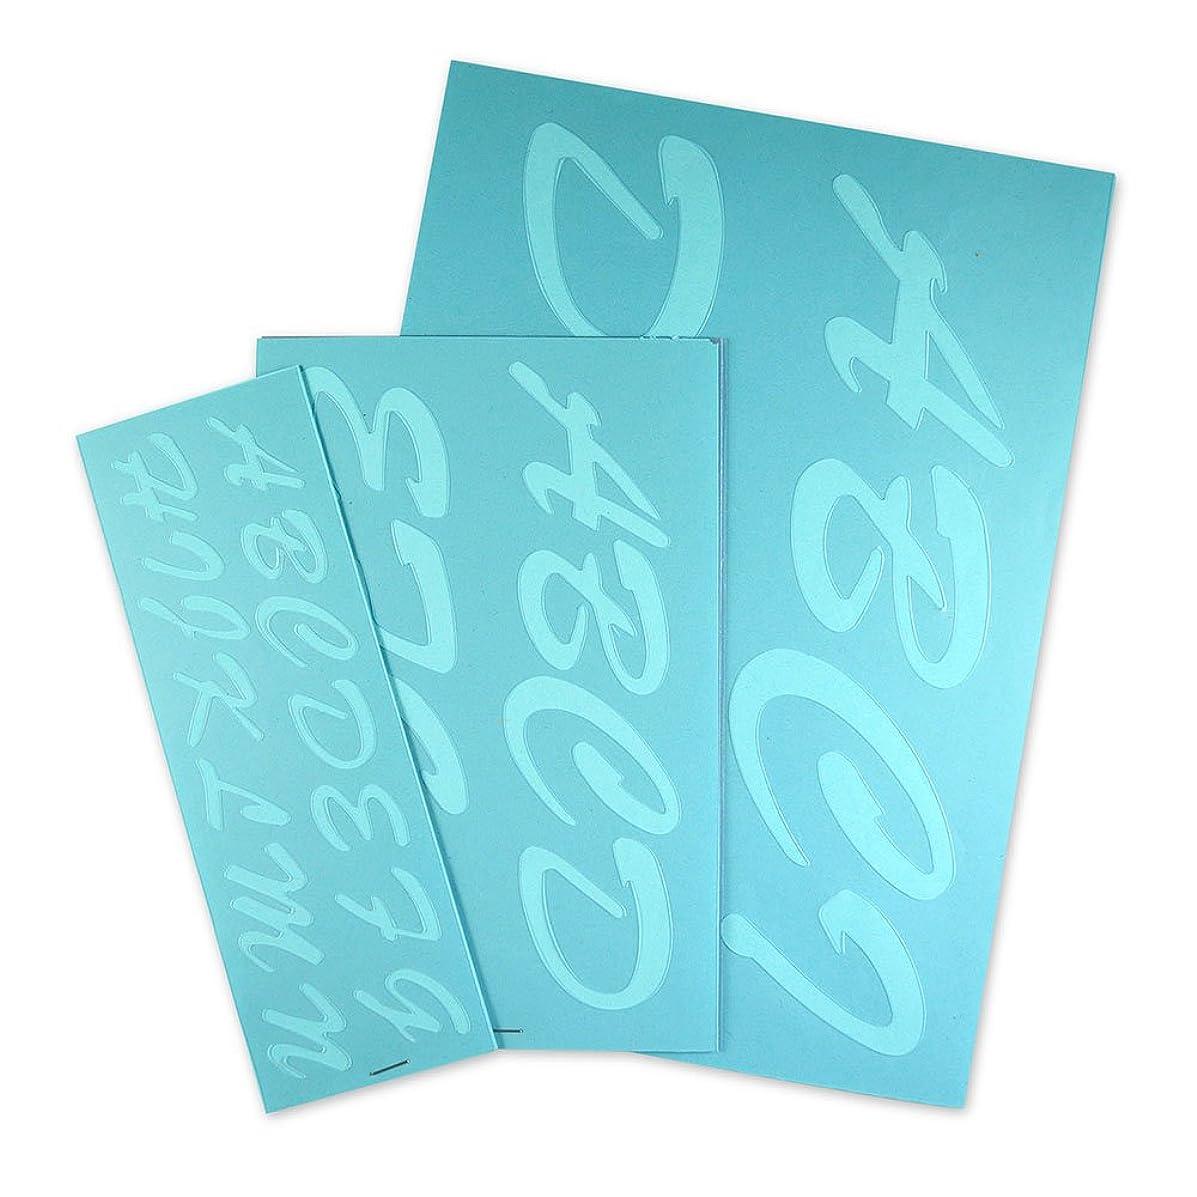 Cosco Stencil Kit, Letters, Transparent Plastic Script 1-3 Inches (090310)